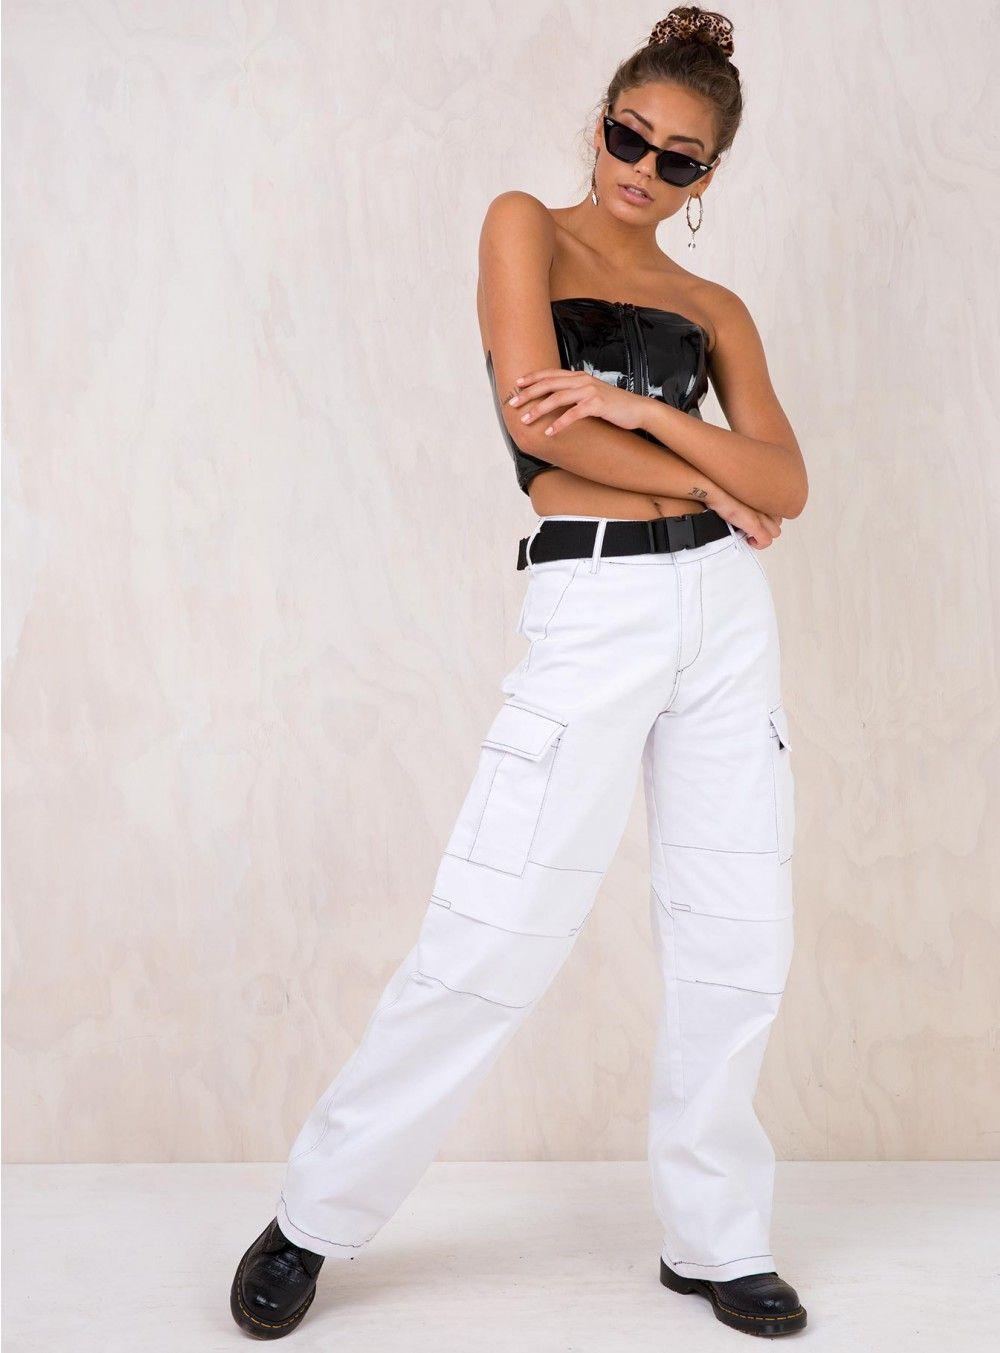 I.AM.GIA Ace Pants White Pants, Fashion, Leggings are